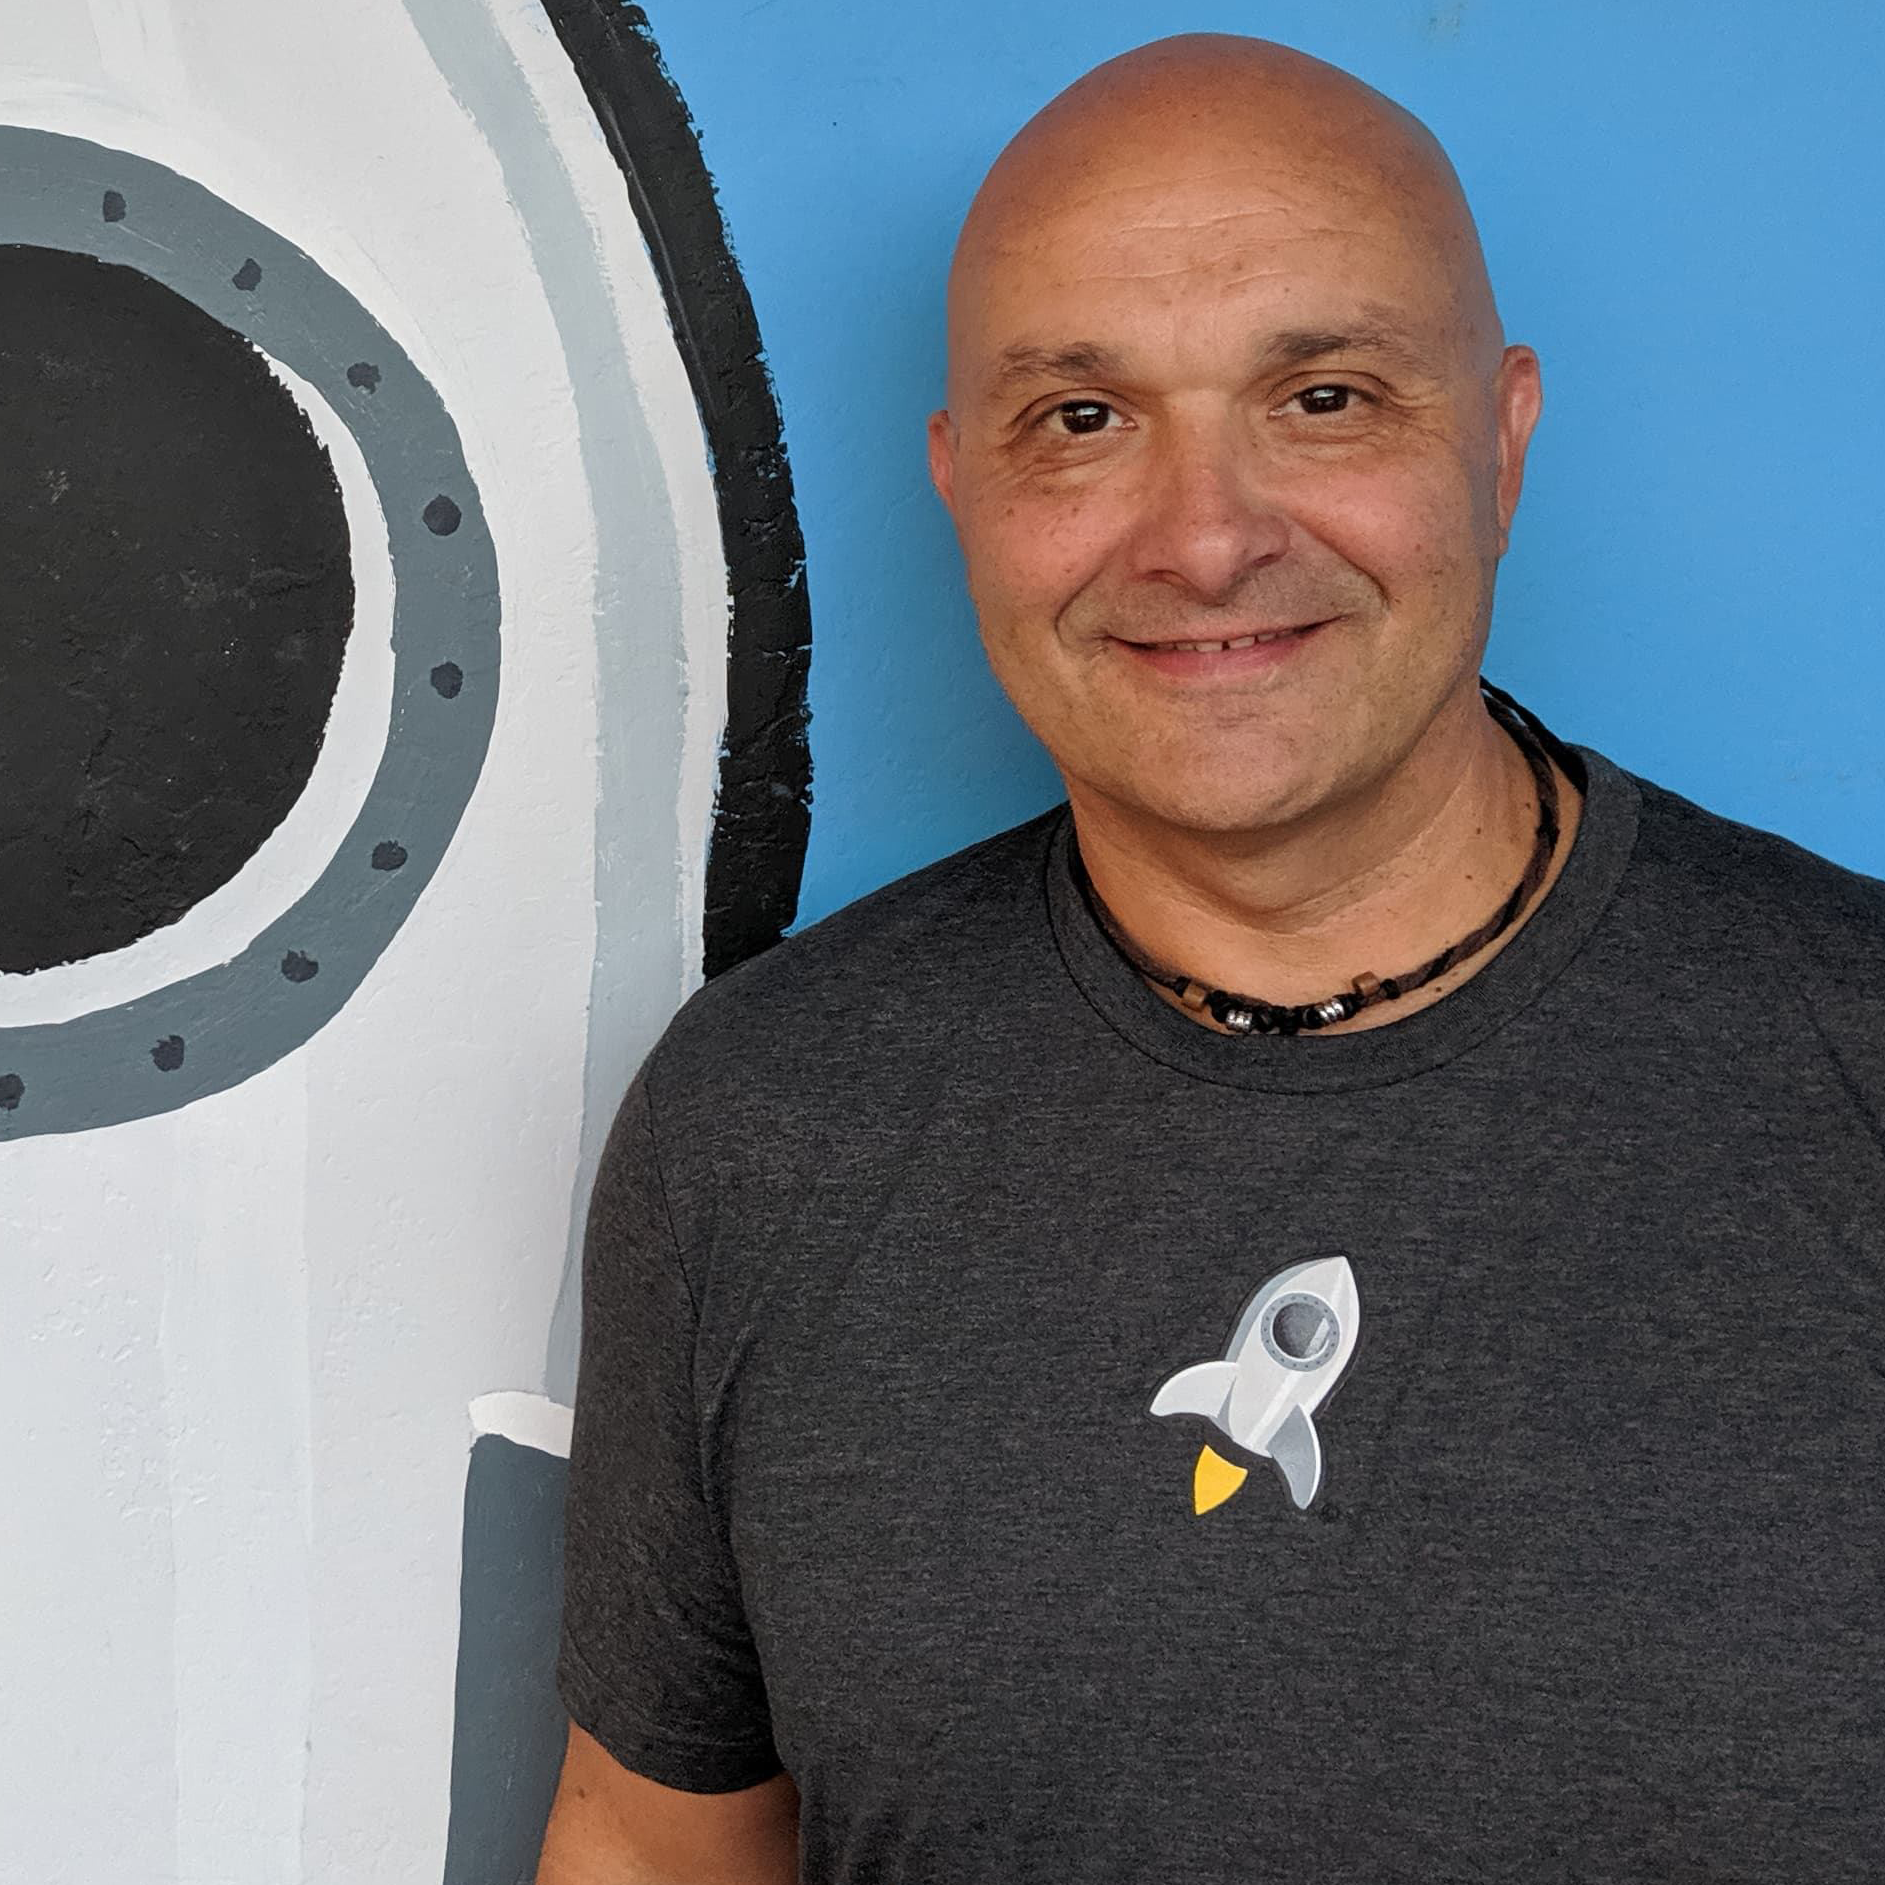 JC Duarte, Chief Operating Officer at ServiceRocket.